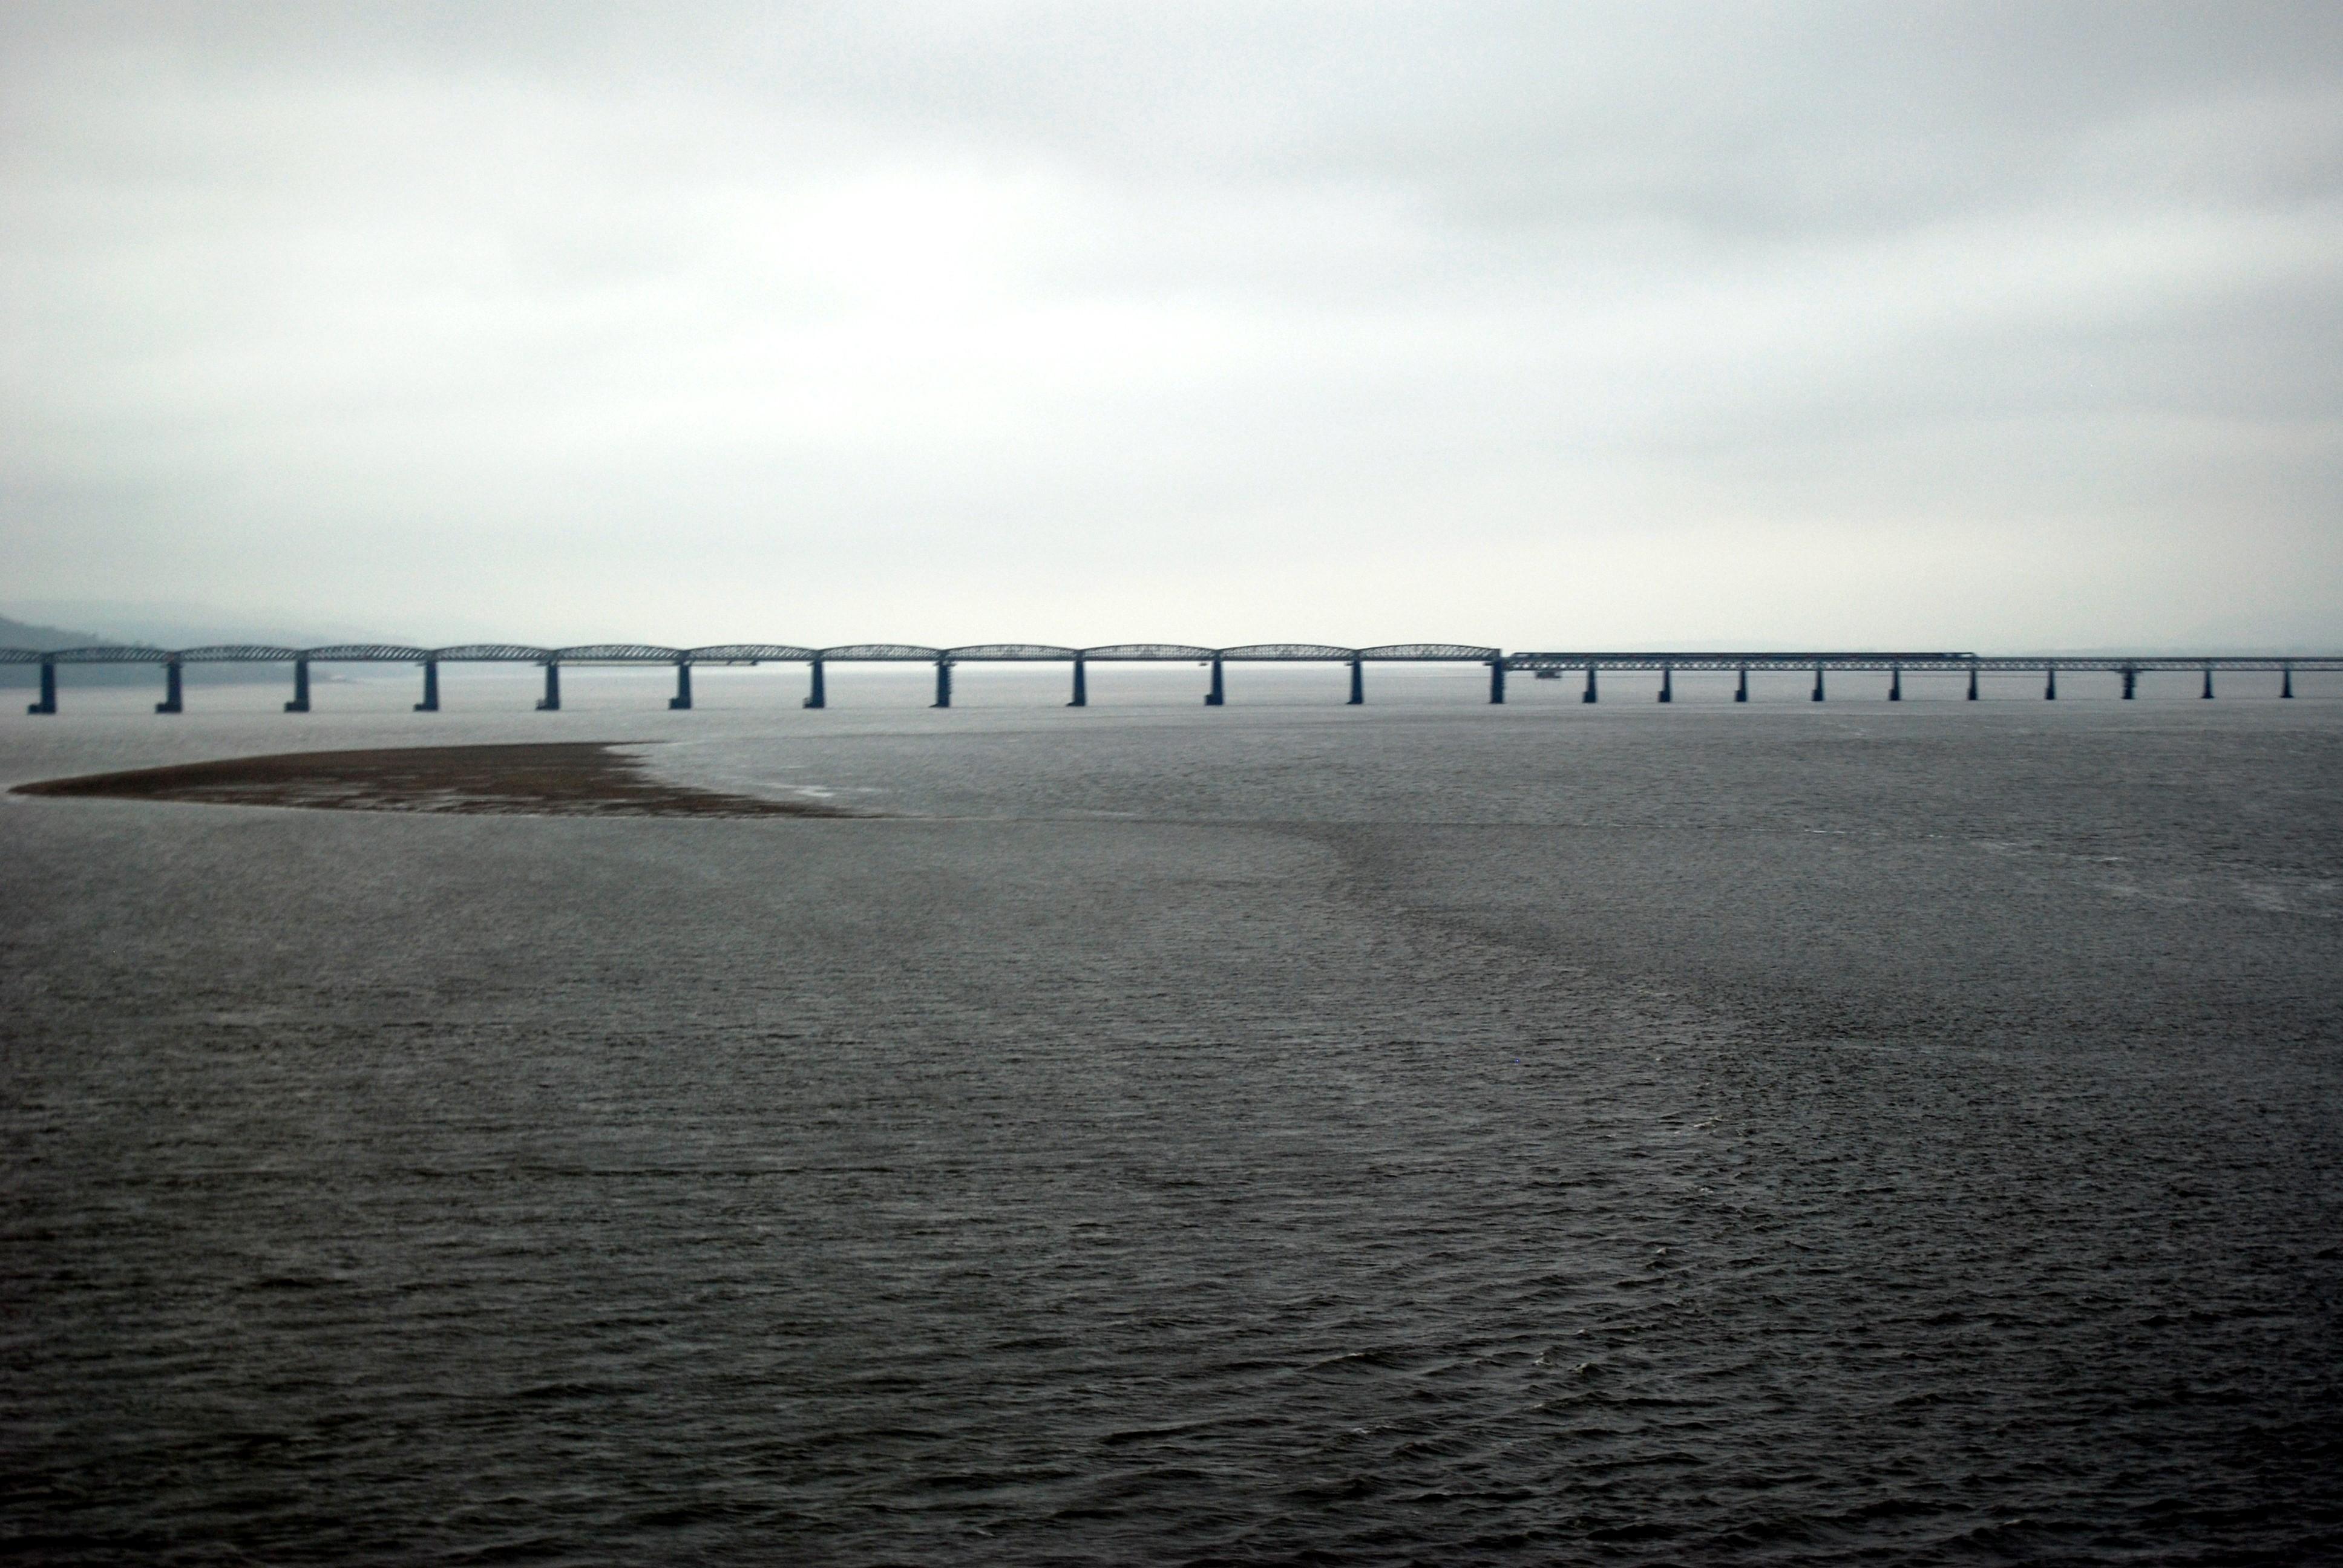 Firth of Forth Bridge, Scotland